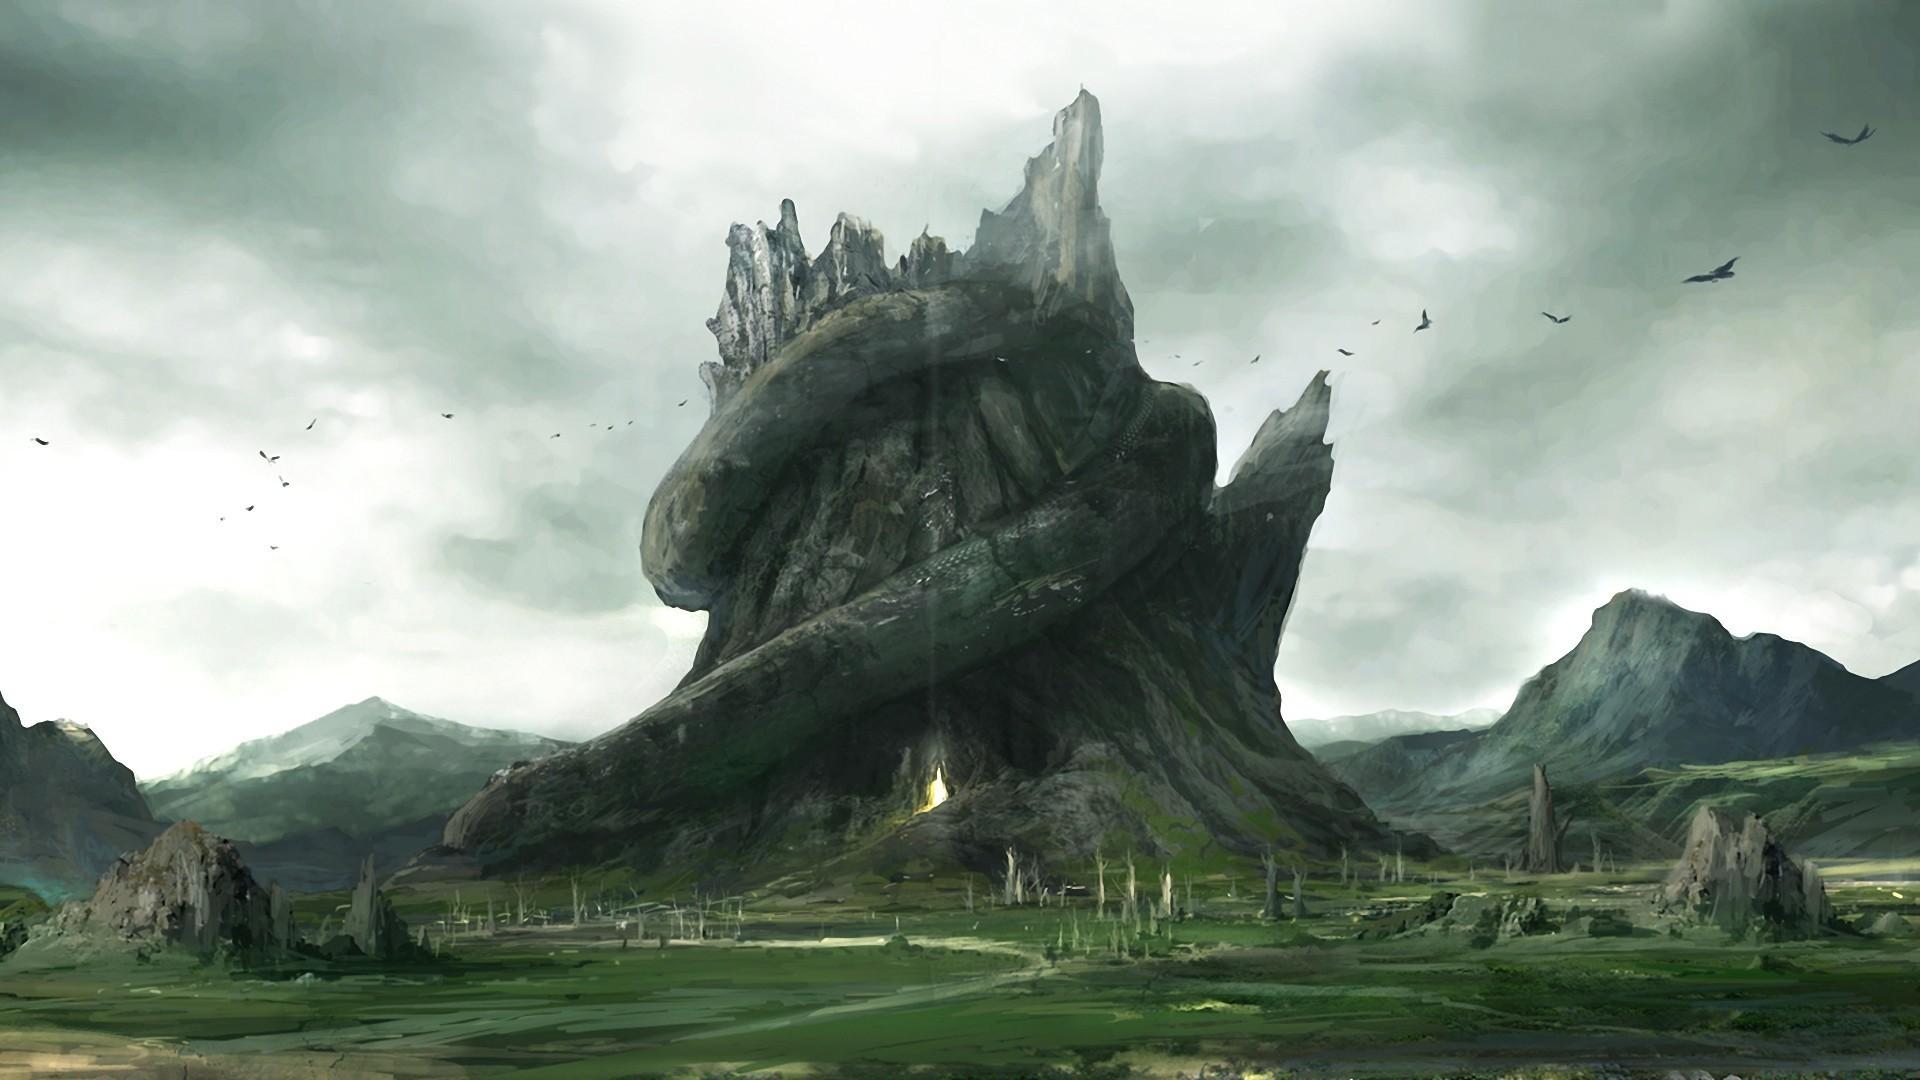 Httpartcobainiantartartsnake mountain 217056089 full hd fantasy castle landscape mountain city sky cloud wallpaper voltagebd Image collections